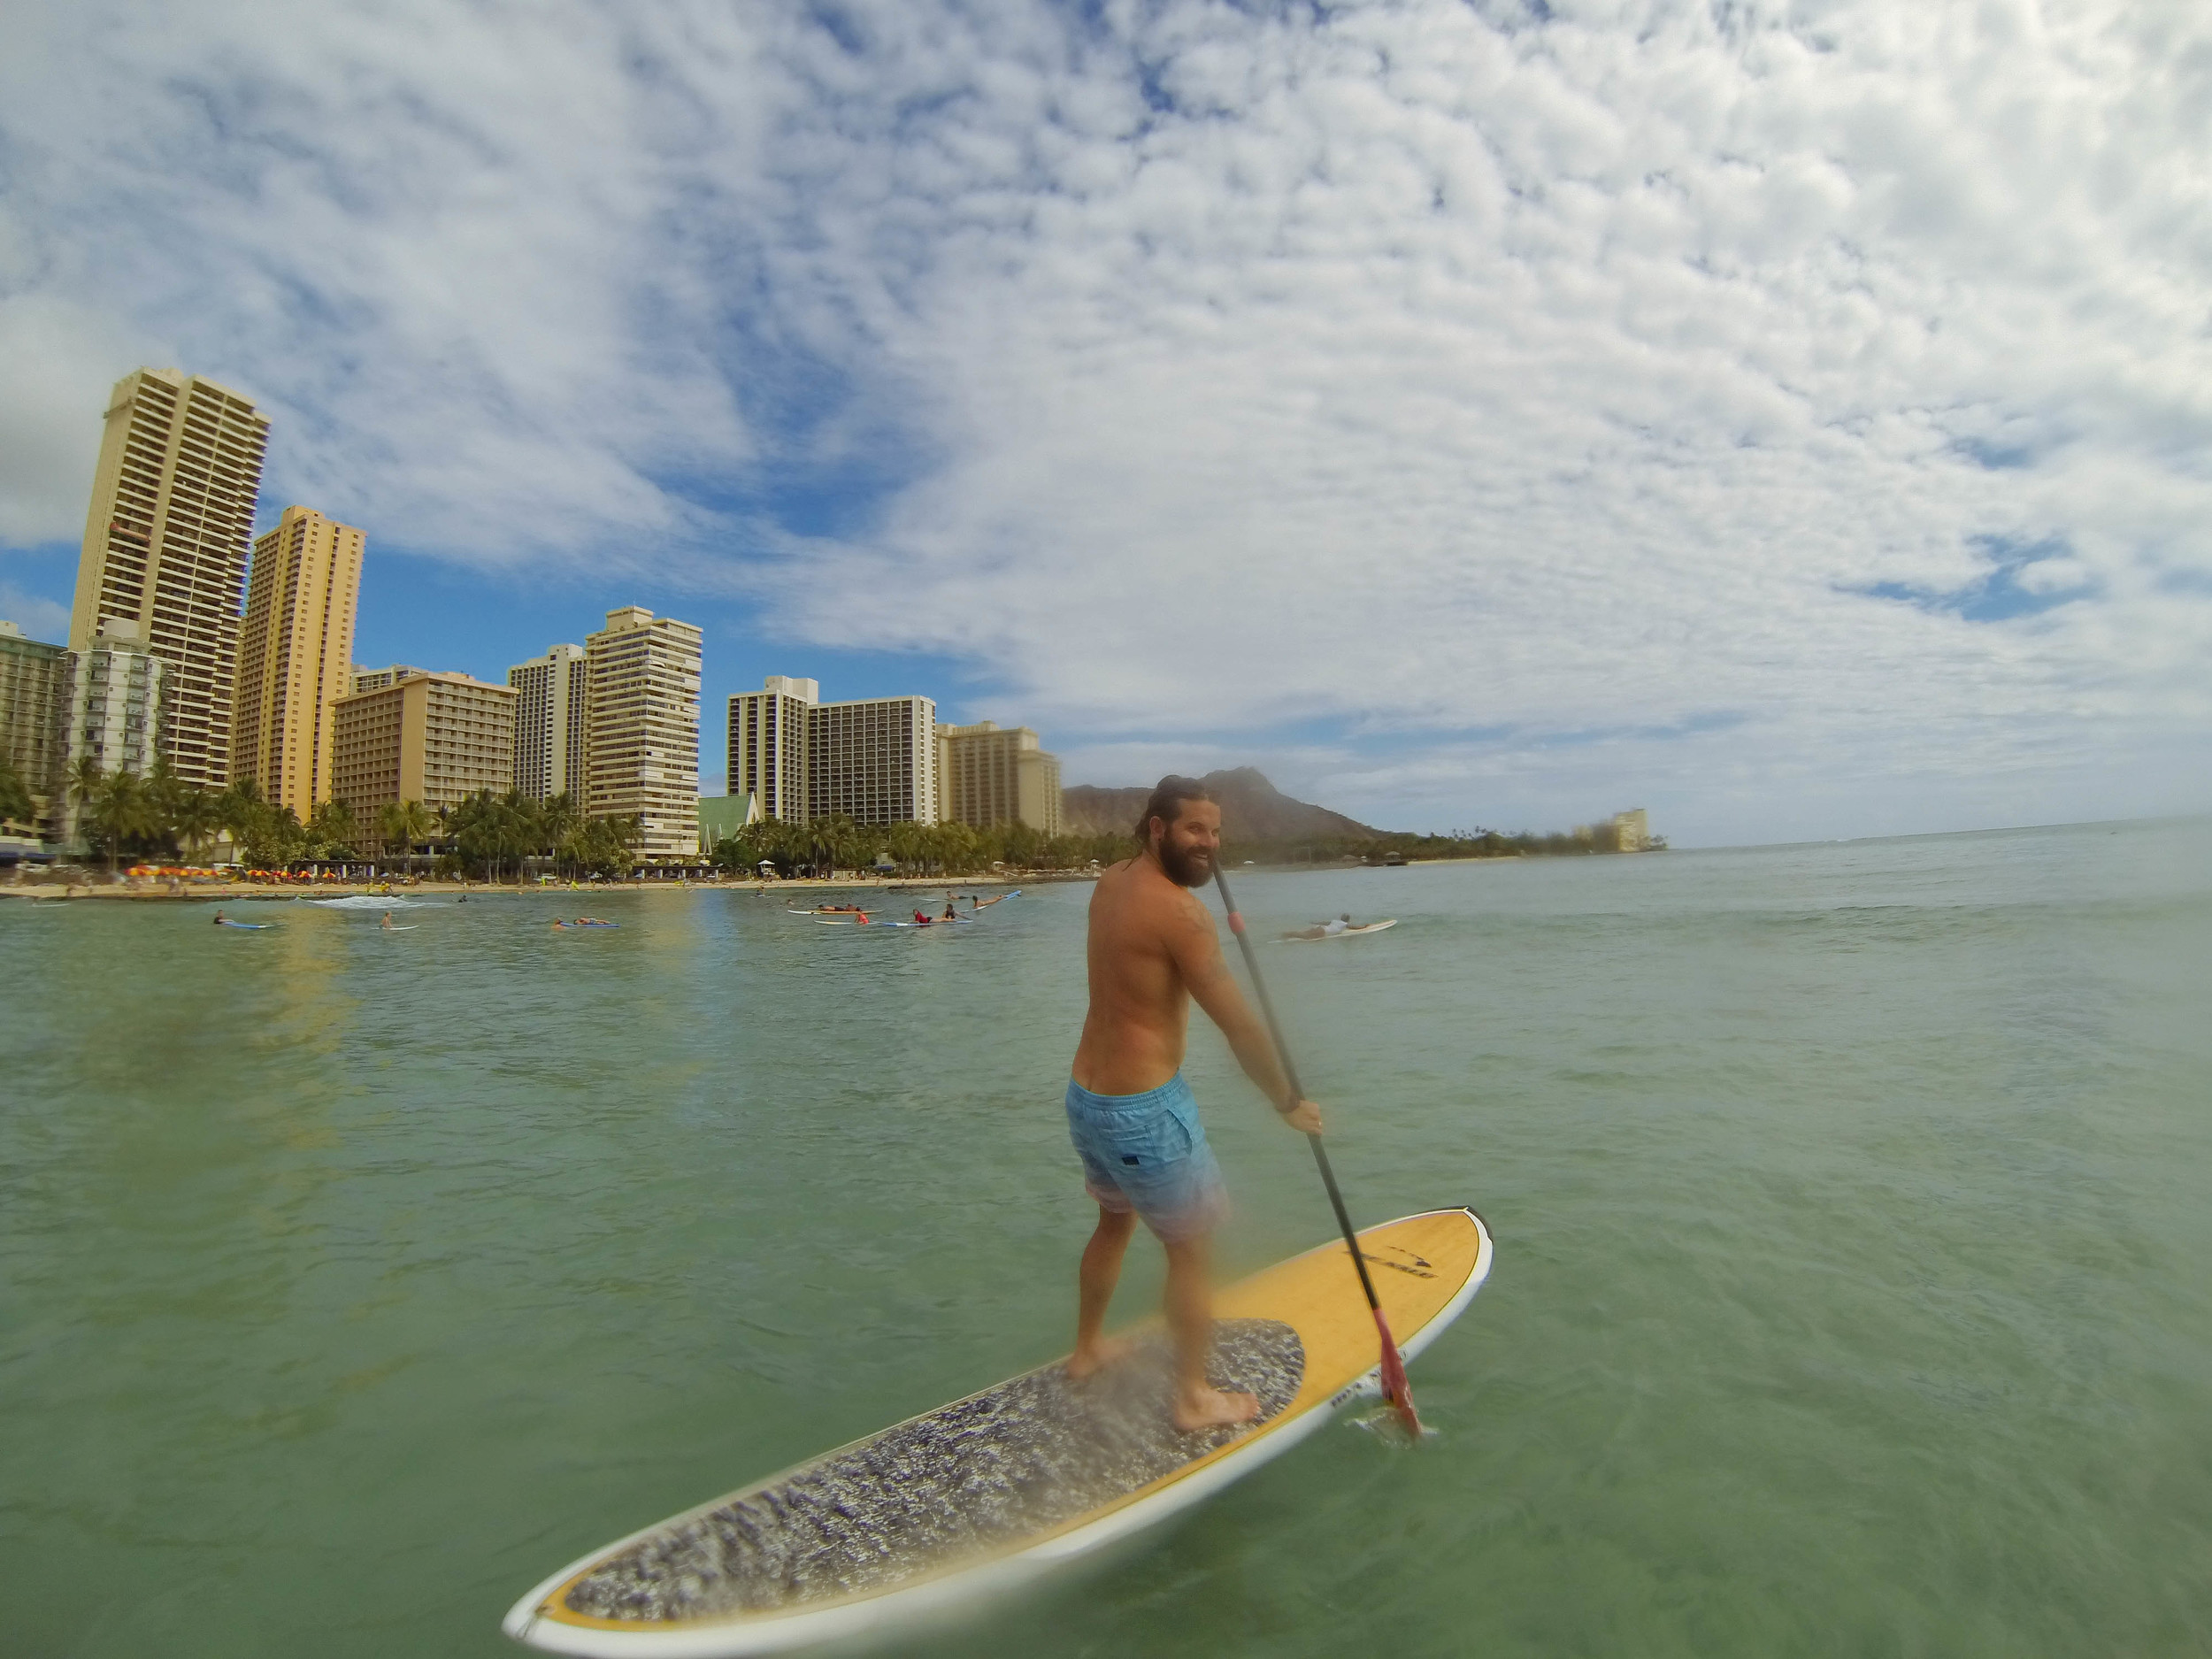 SUP at Waikiki Beach, Oahu.